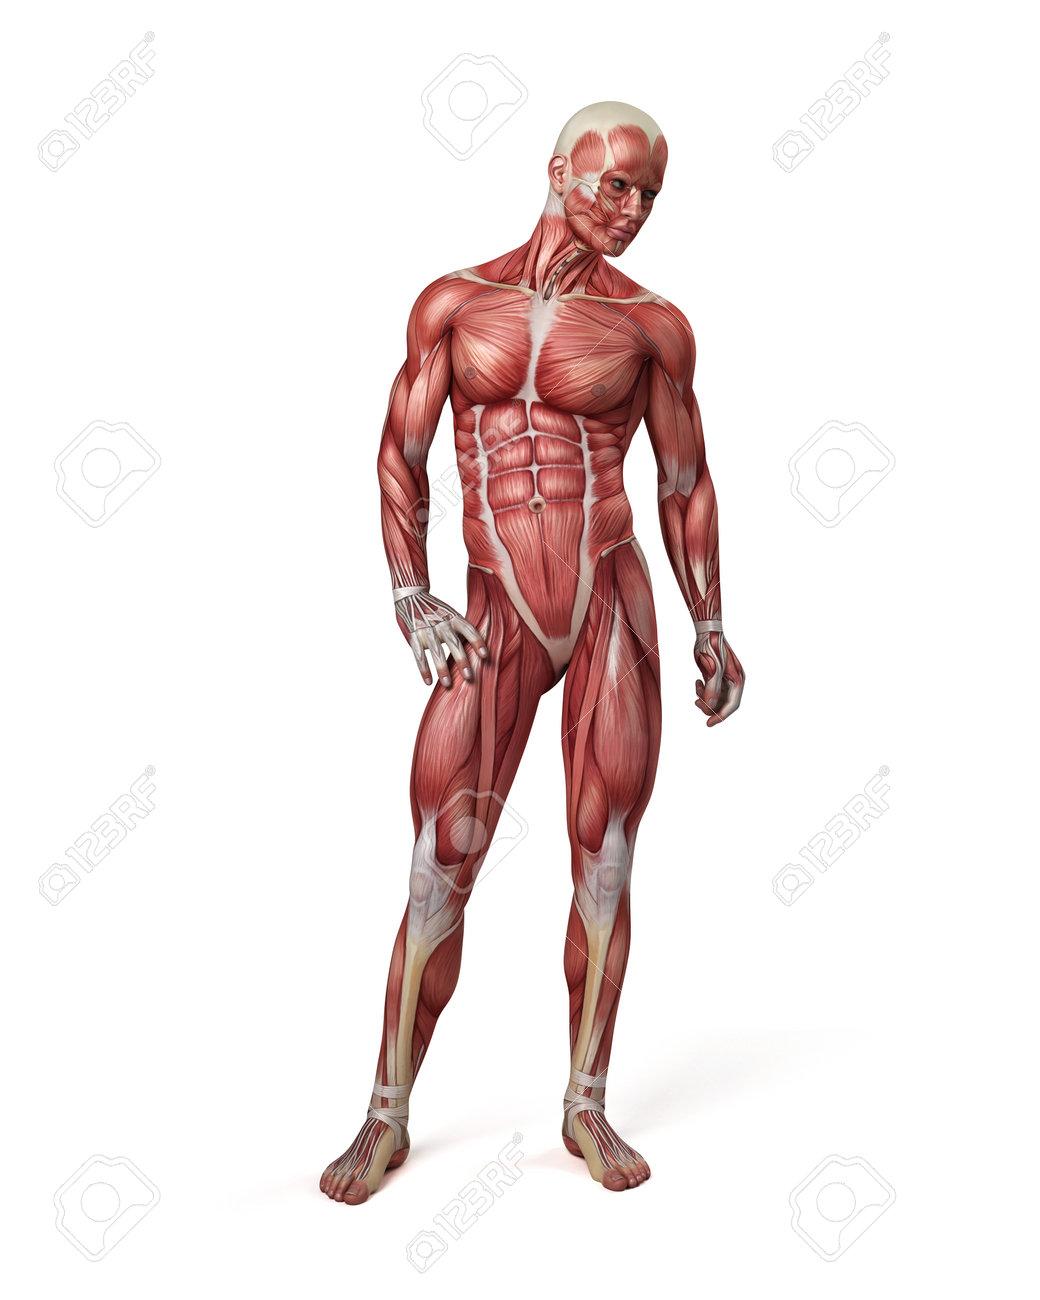 3d Ilustración Médica Del Sistema Muscular Masculina Fotos, Retratos ...